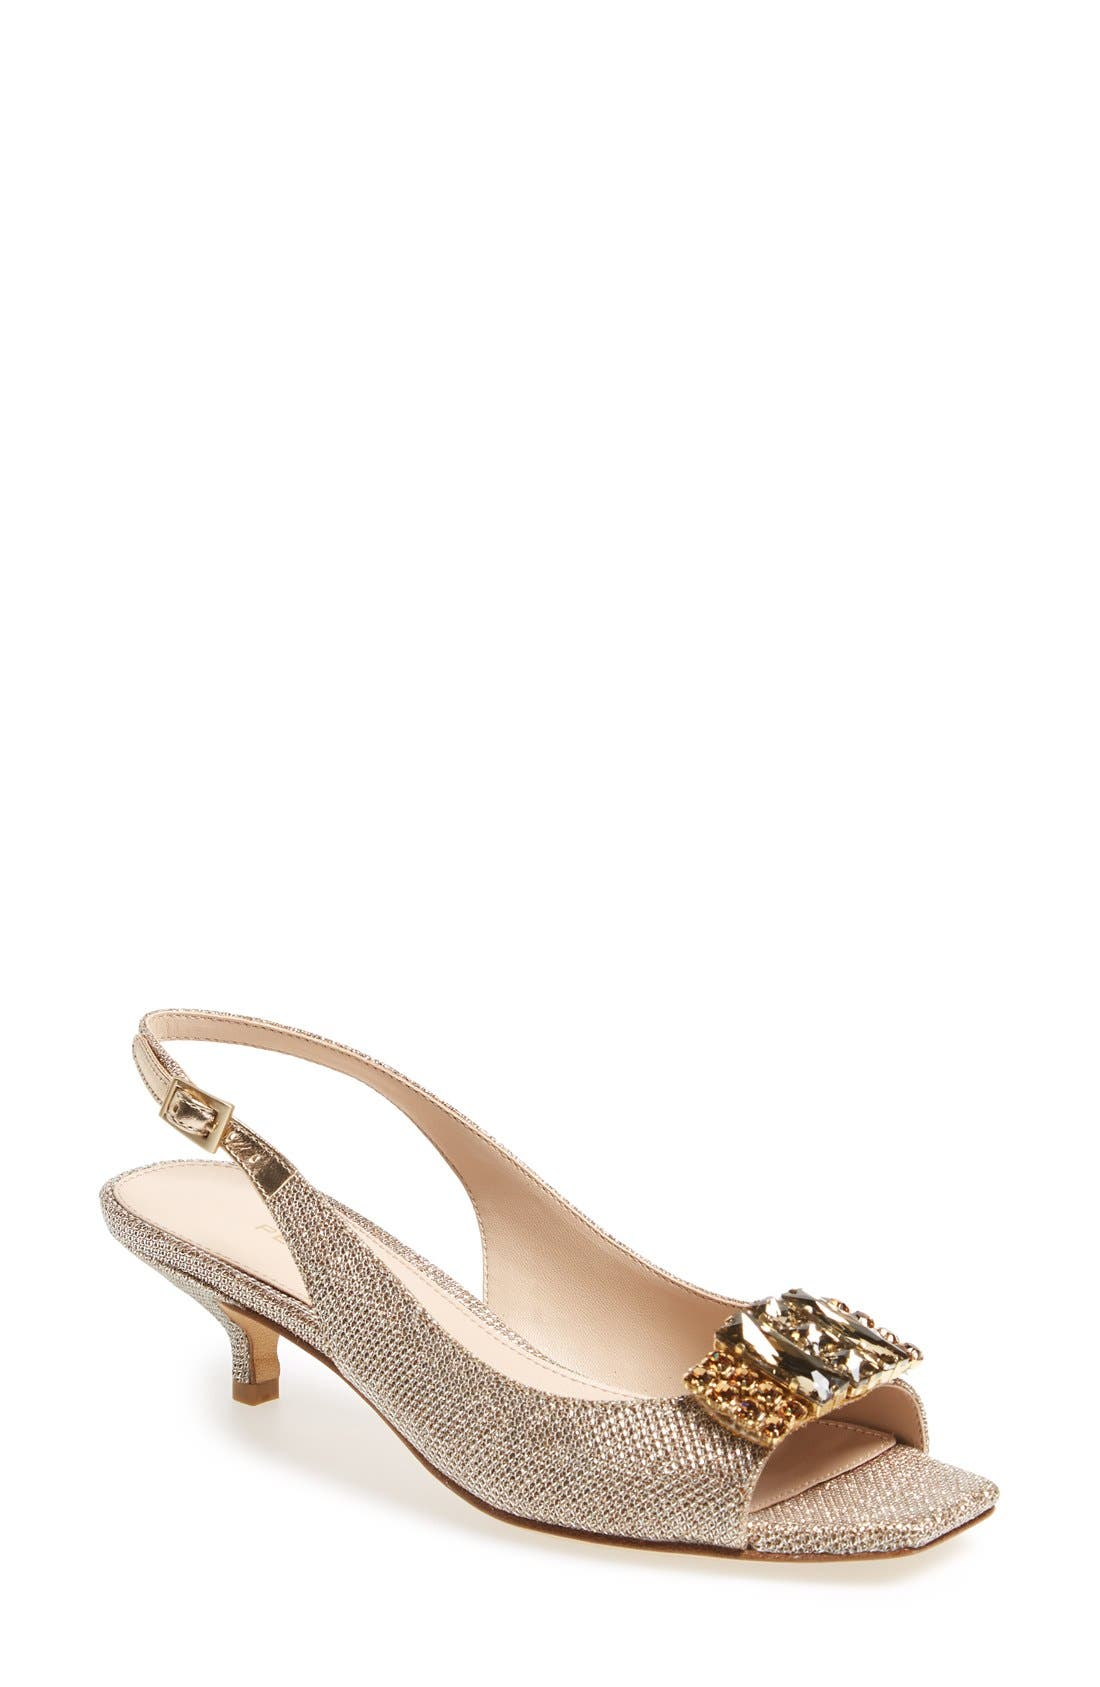 Alternate Image 1 Selected - Pelle Moda 'Fresh' Jeweled Metallic Leather Slingback Sandal (Women)